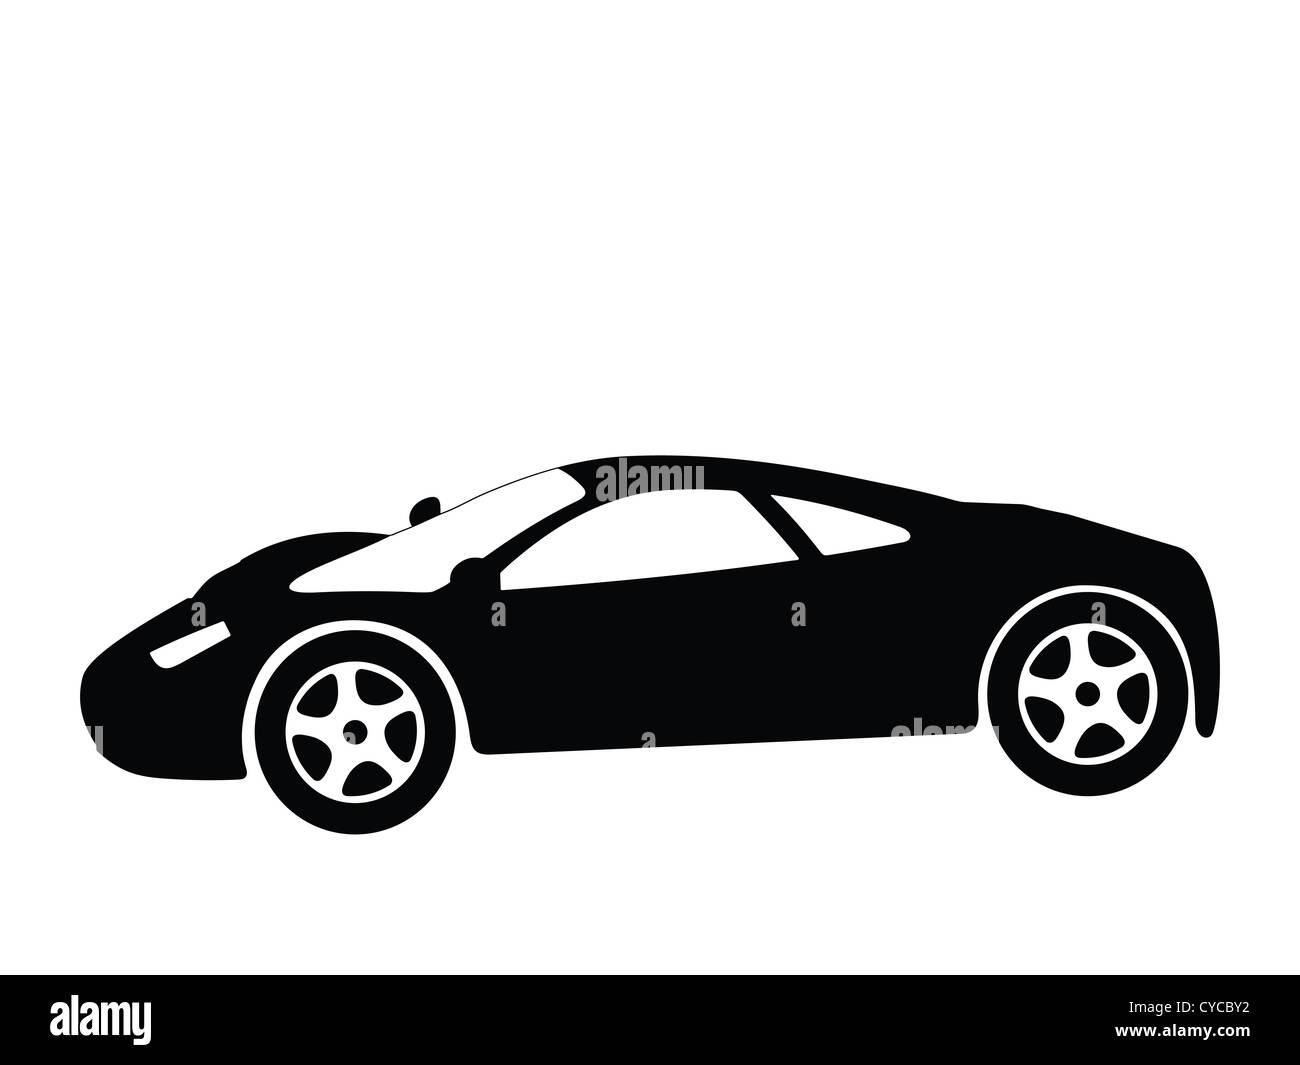 Black Silhouette On A Sport Car Vector Illustration Stock Photo